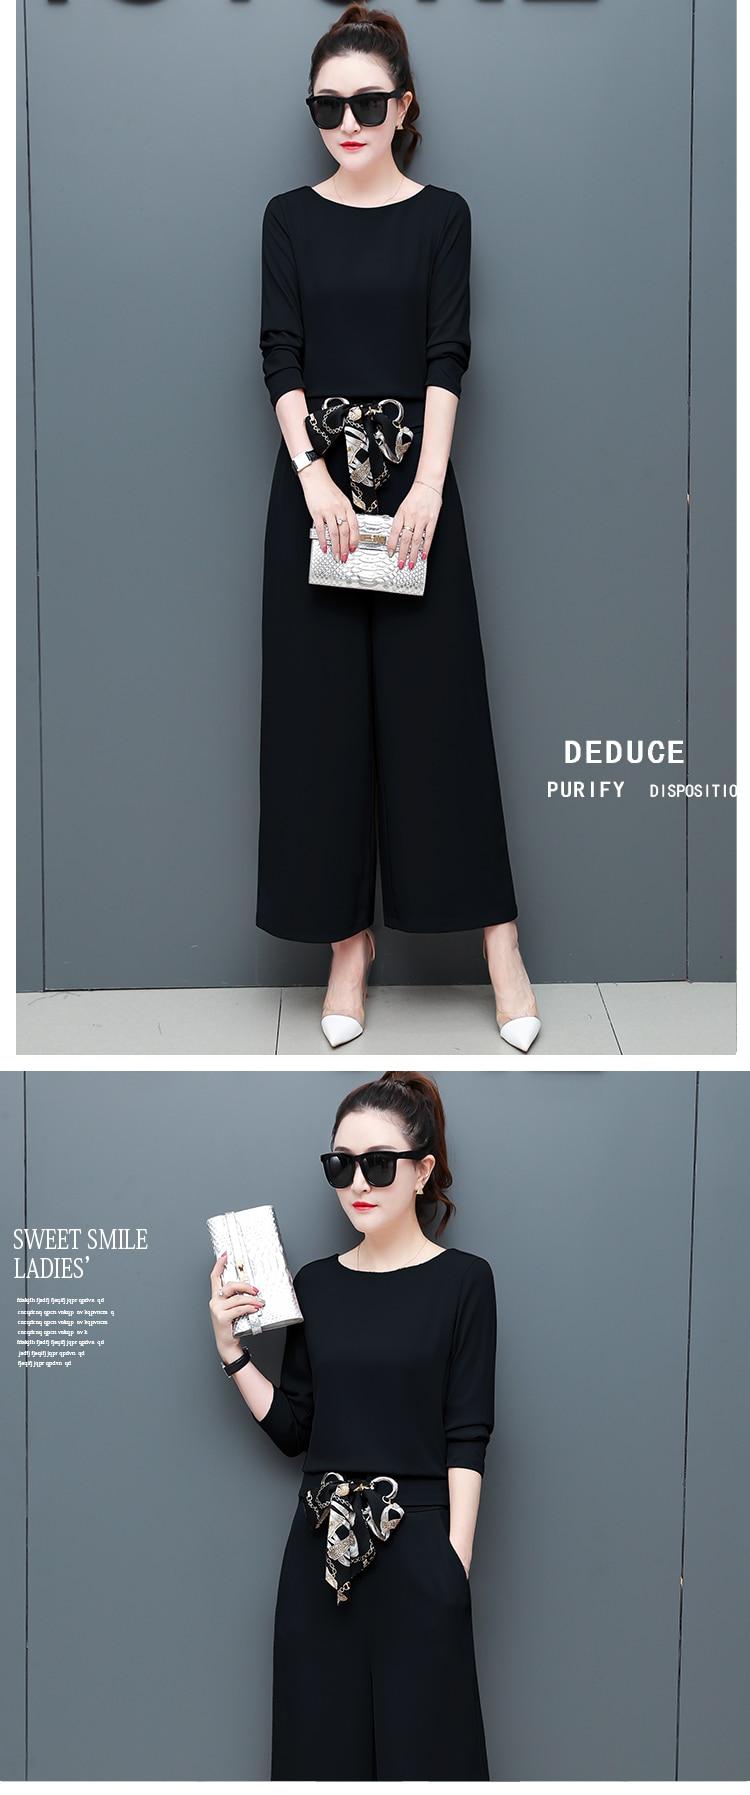 Chiffon 2 Piece Set Women Long Sleeve Tops And Wide Leg Pants Trousers Set Suits Spring Autumn Casual Office Elegant Women's Set 20 Online shopping Bangladesh